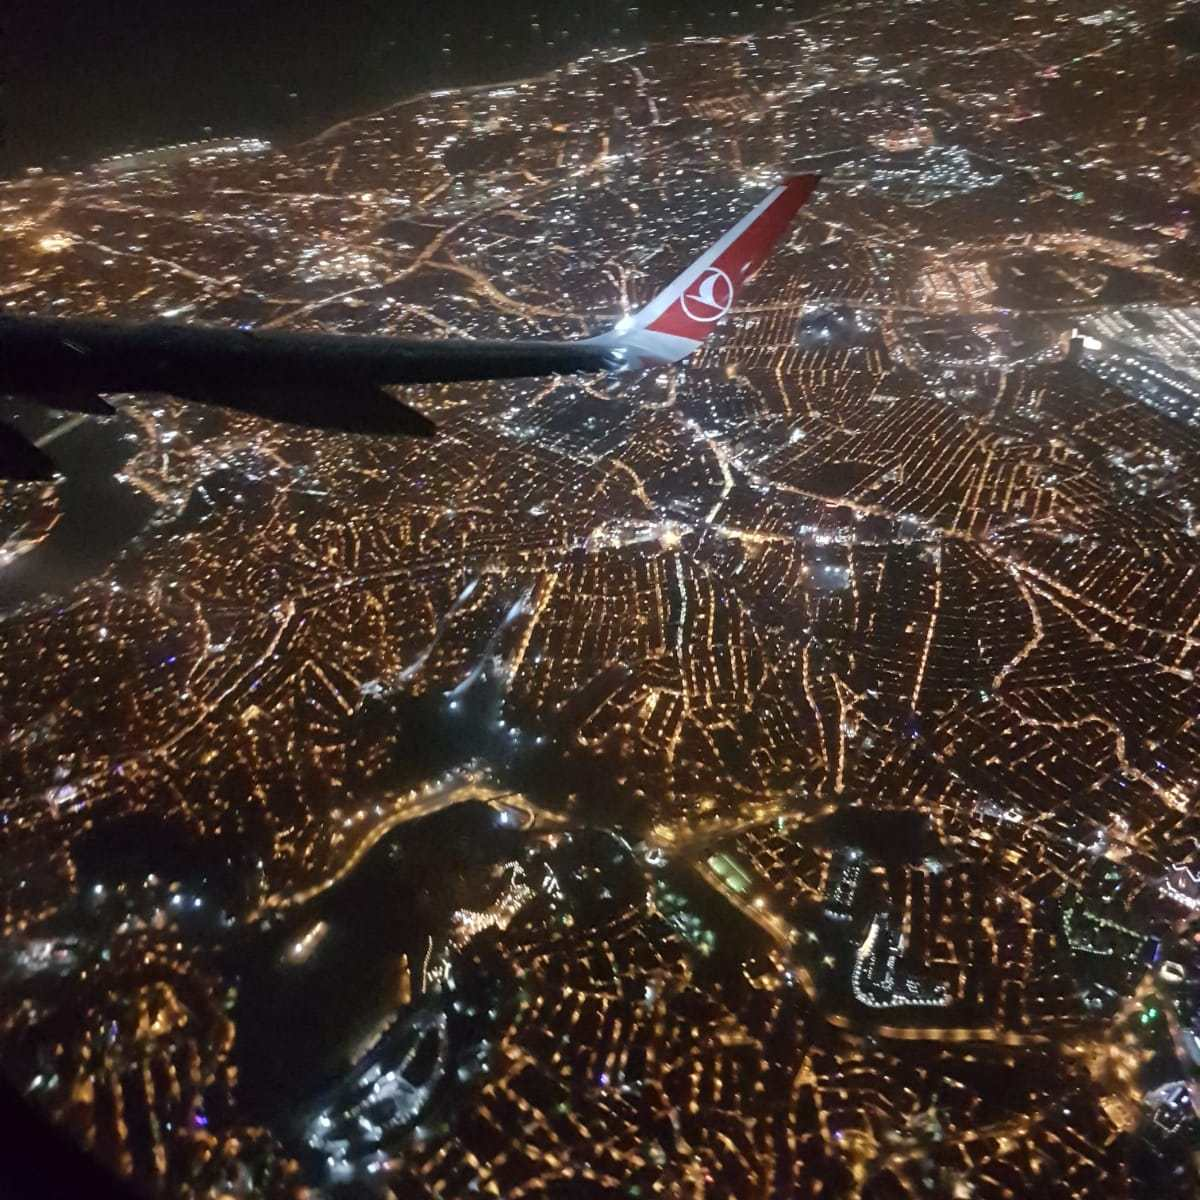 Avion catre Iordania